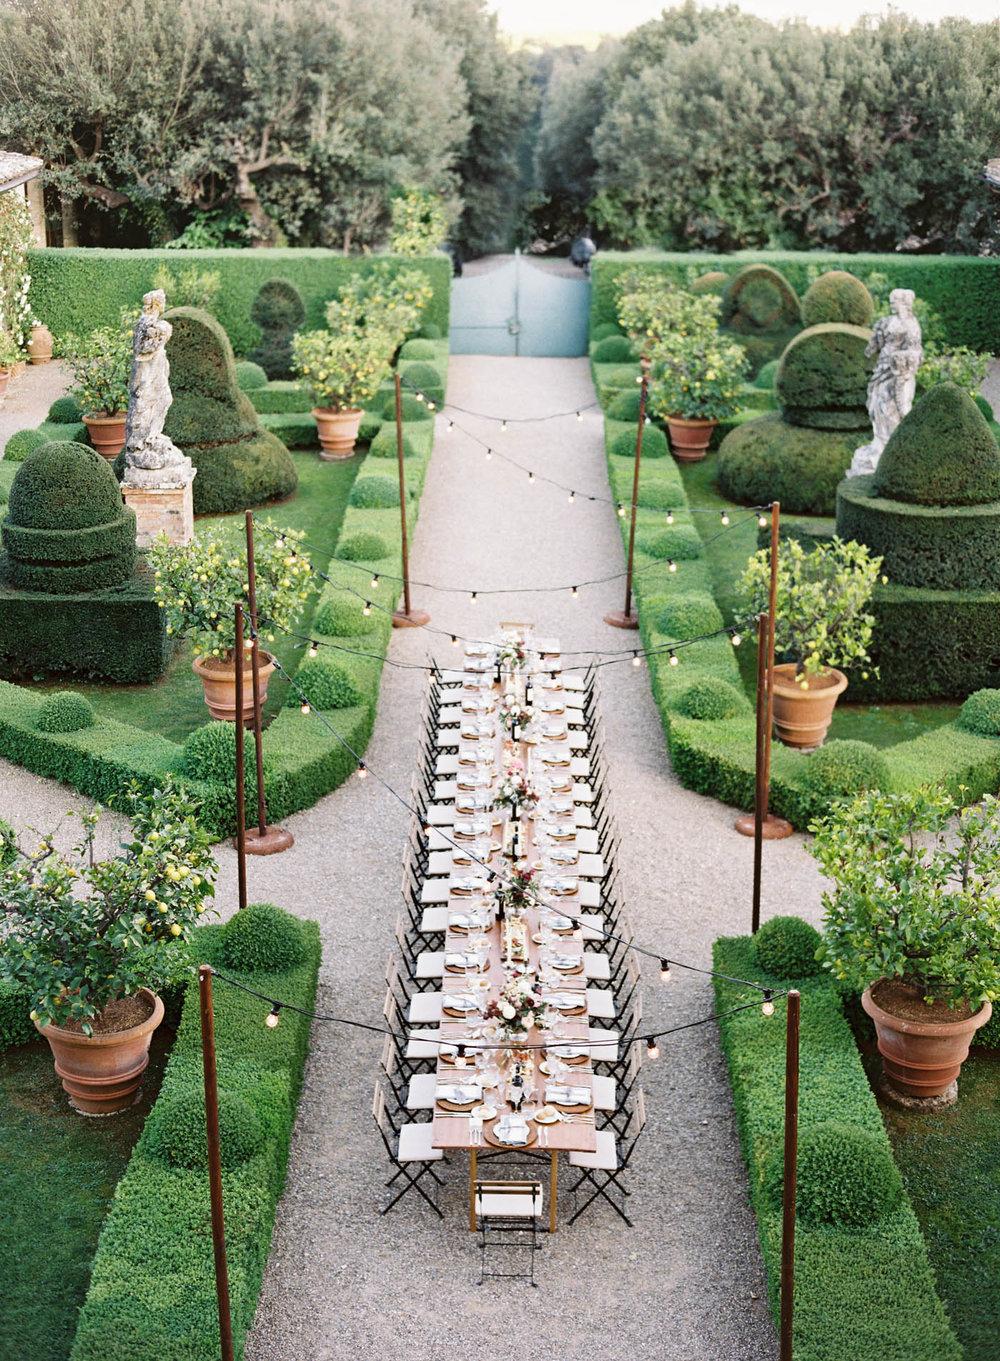 Villa_Cetinale_Wedding-44-Jen_Huang-ElanJacob-287-Jen_Huang-007302-R1-012.jpg